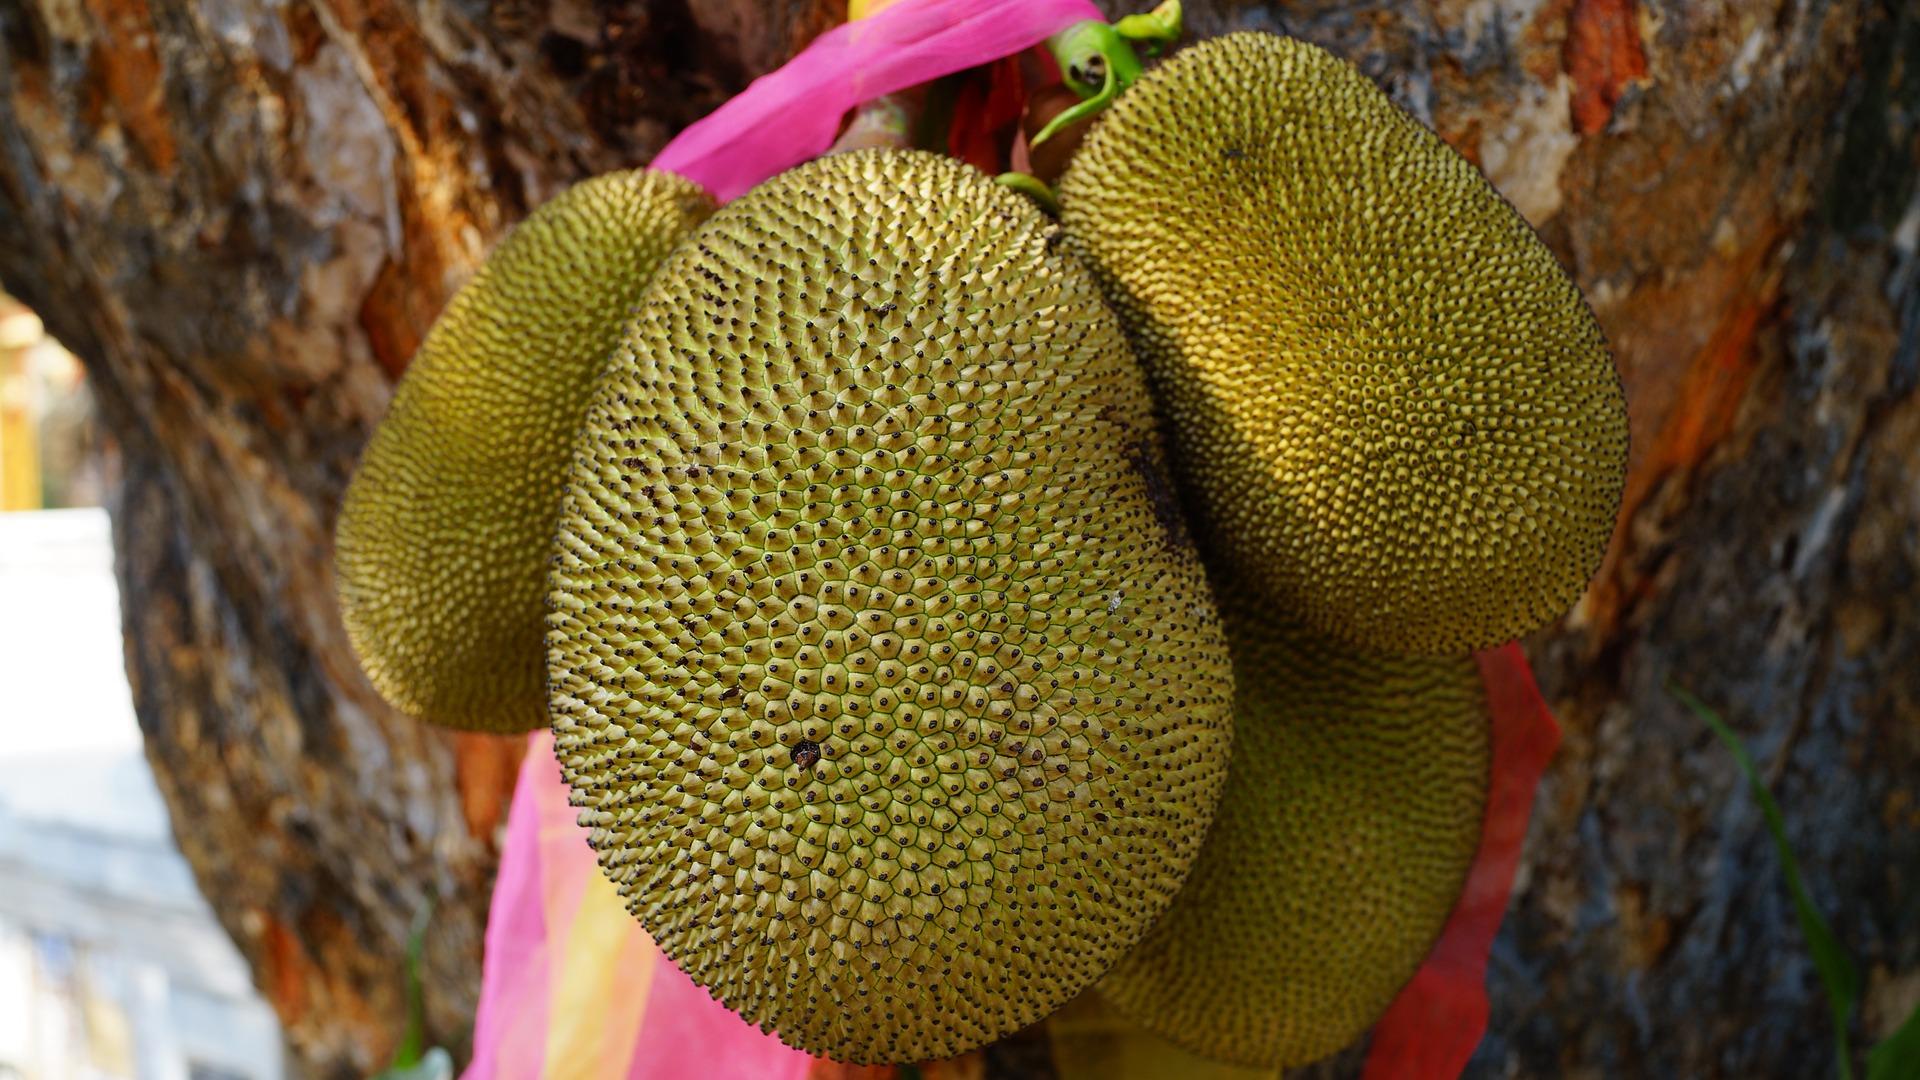 jackfruit-1087108_1920